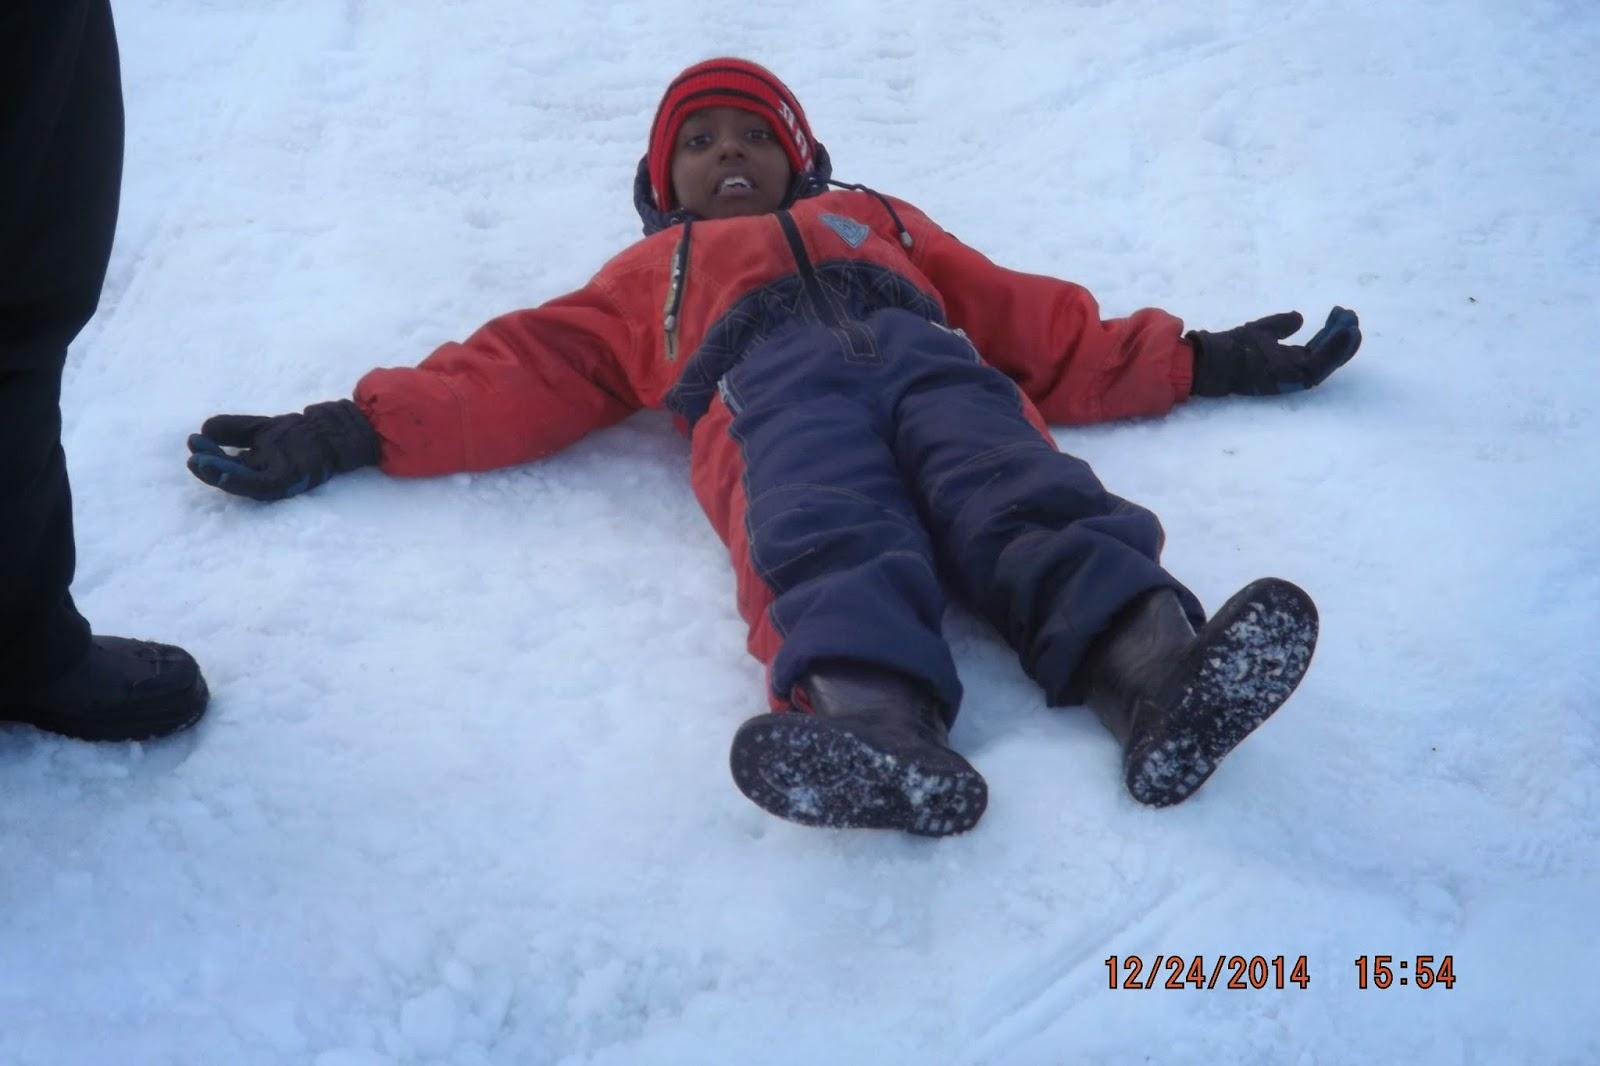 Chandradittya Banik enjoying the snow